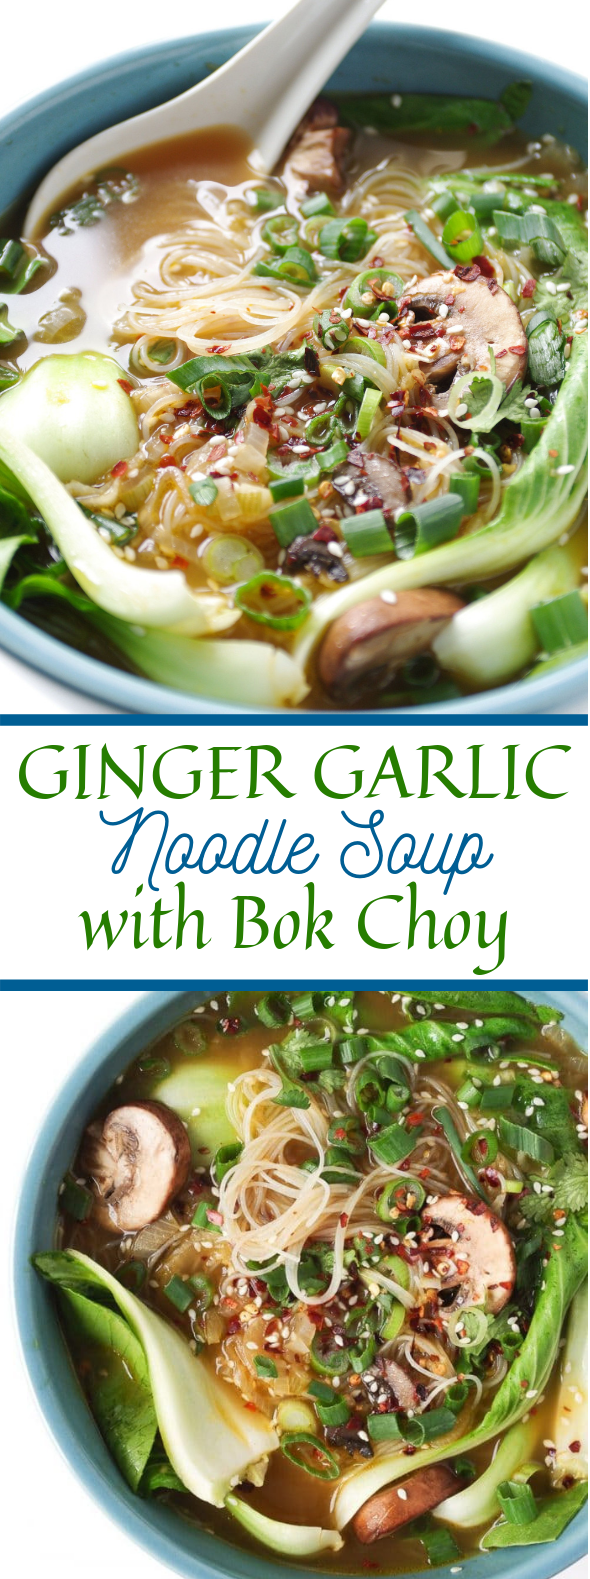 GINGER GARLIC NOODLE SOUP WITH BOK CHOY (BOK CHOY SOUP) #veggies #vegetarian